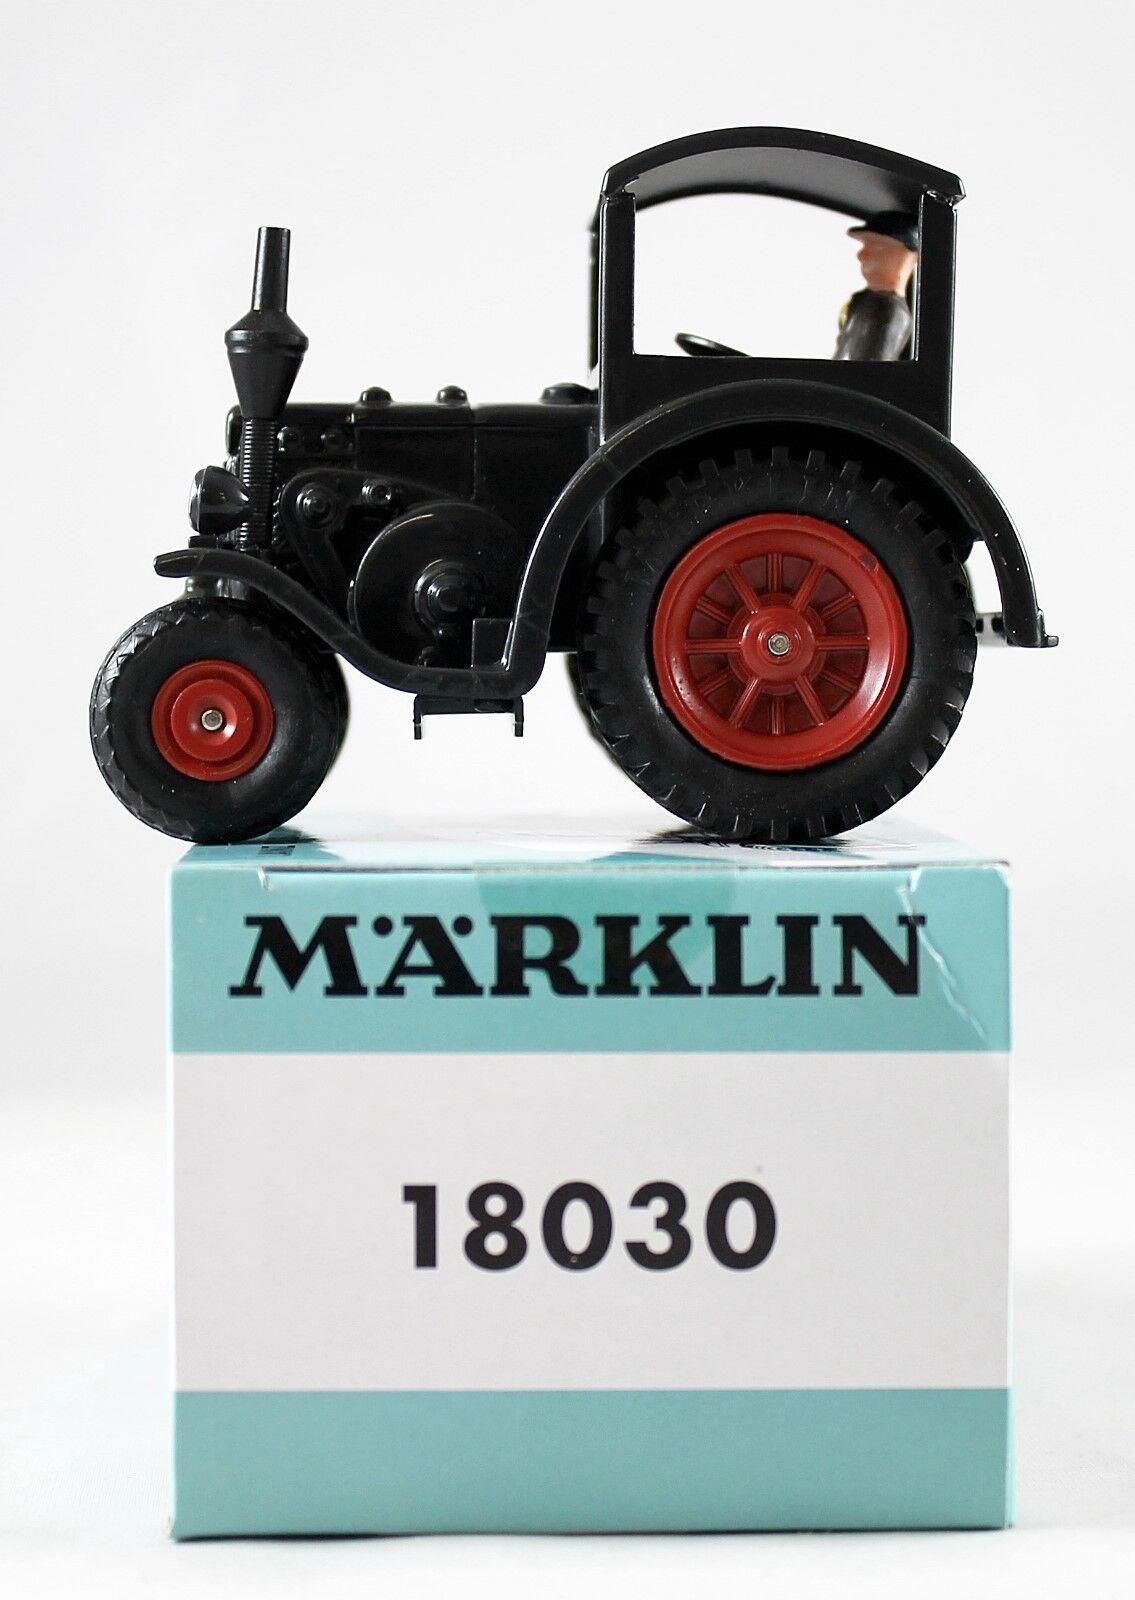 Märklin Lanz Eilbulldog (18030) repainted in the Colour Black  NEW  with Original Box